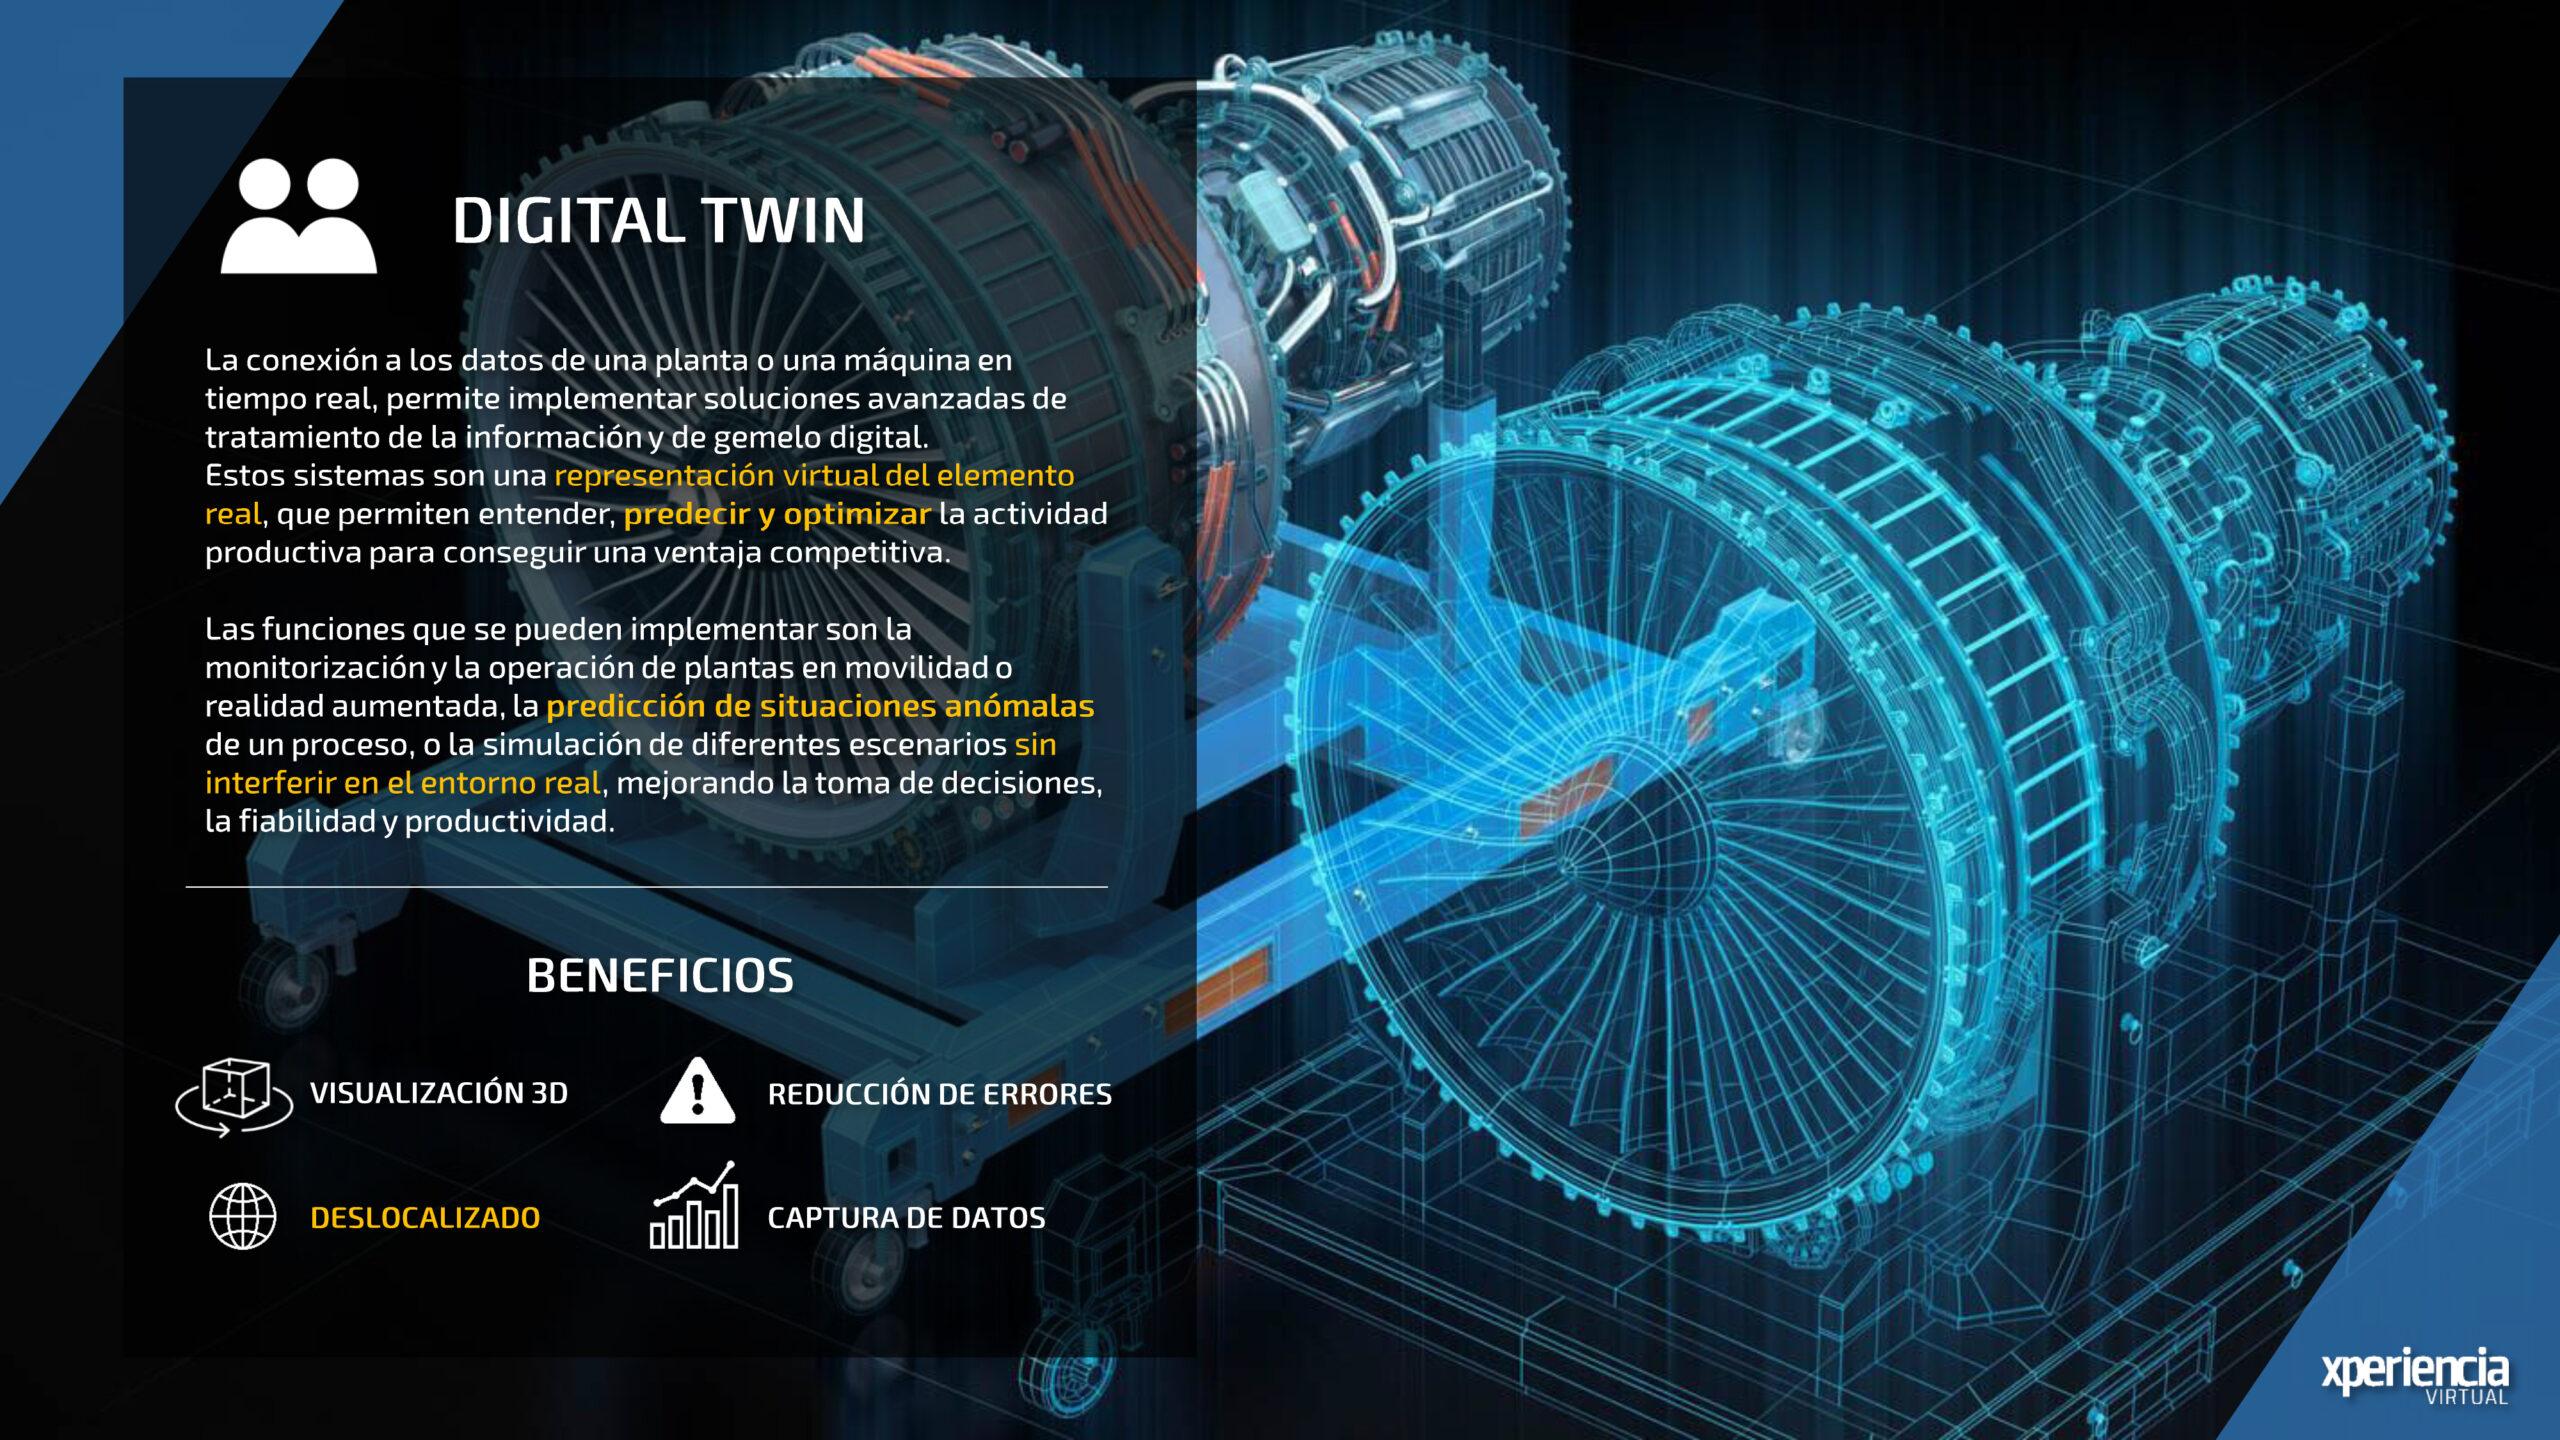 Digital Twin Realidad Virtual Realidad Aumentada Industria 4.0